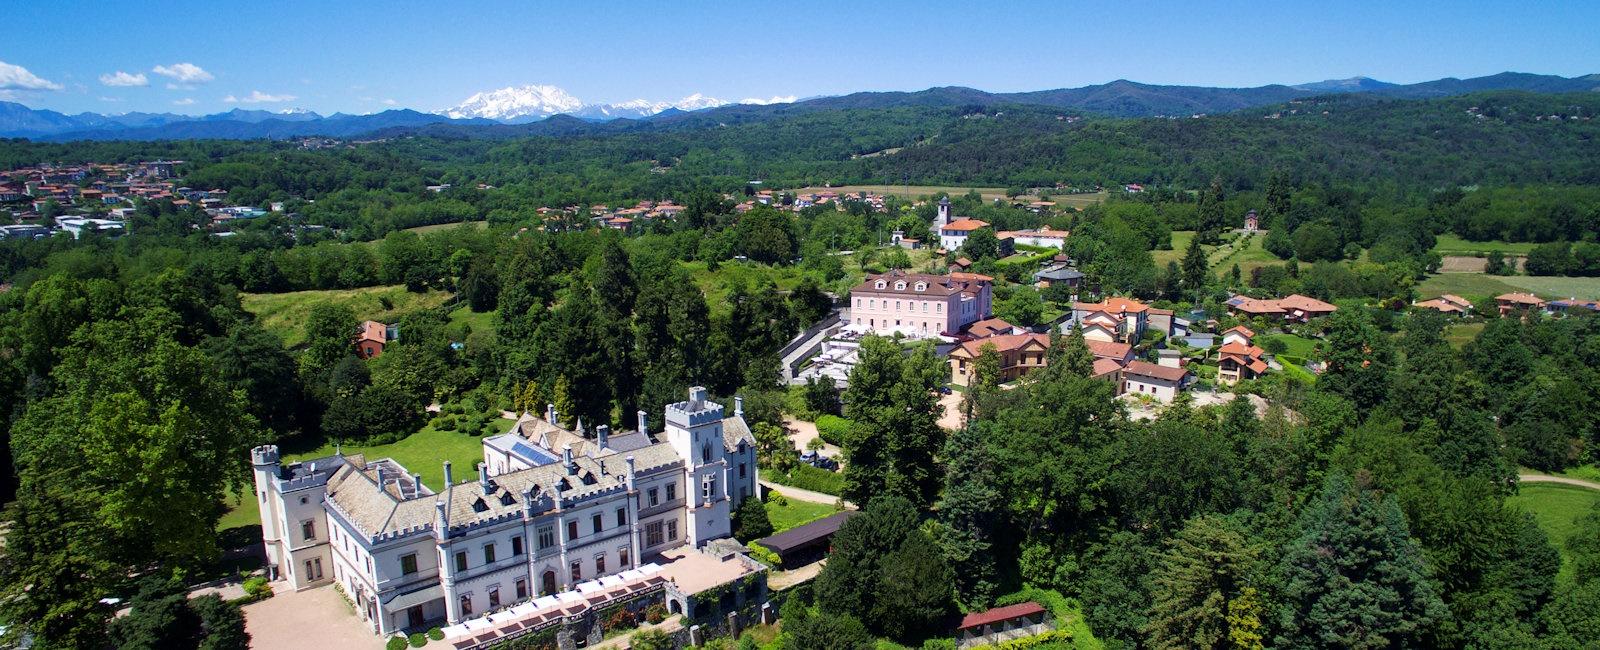 Luxury Oleggio Castello Holidays